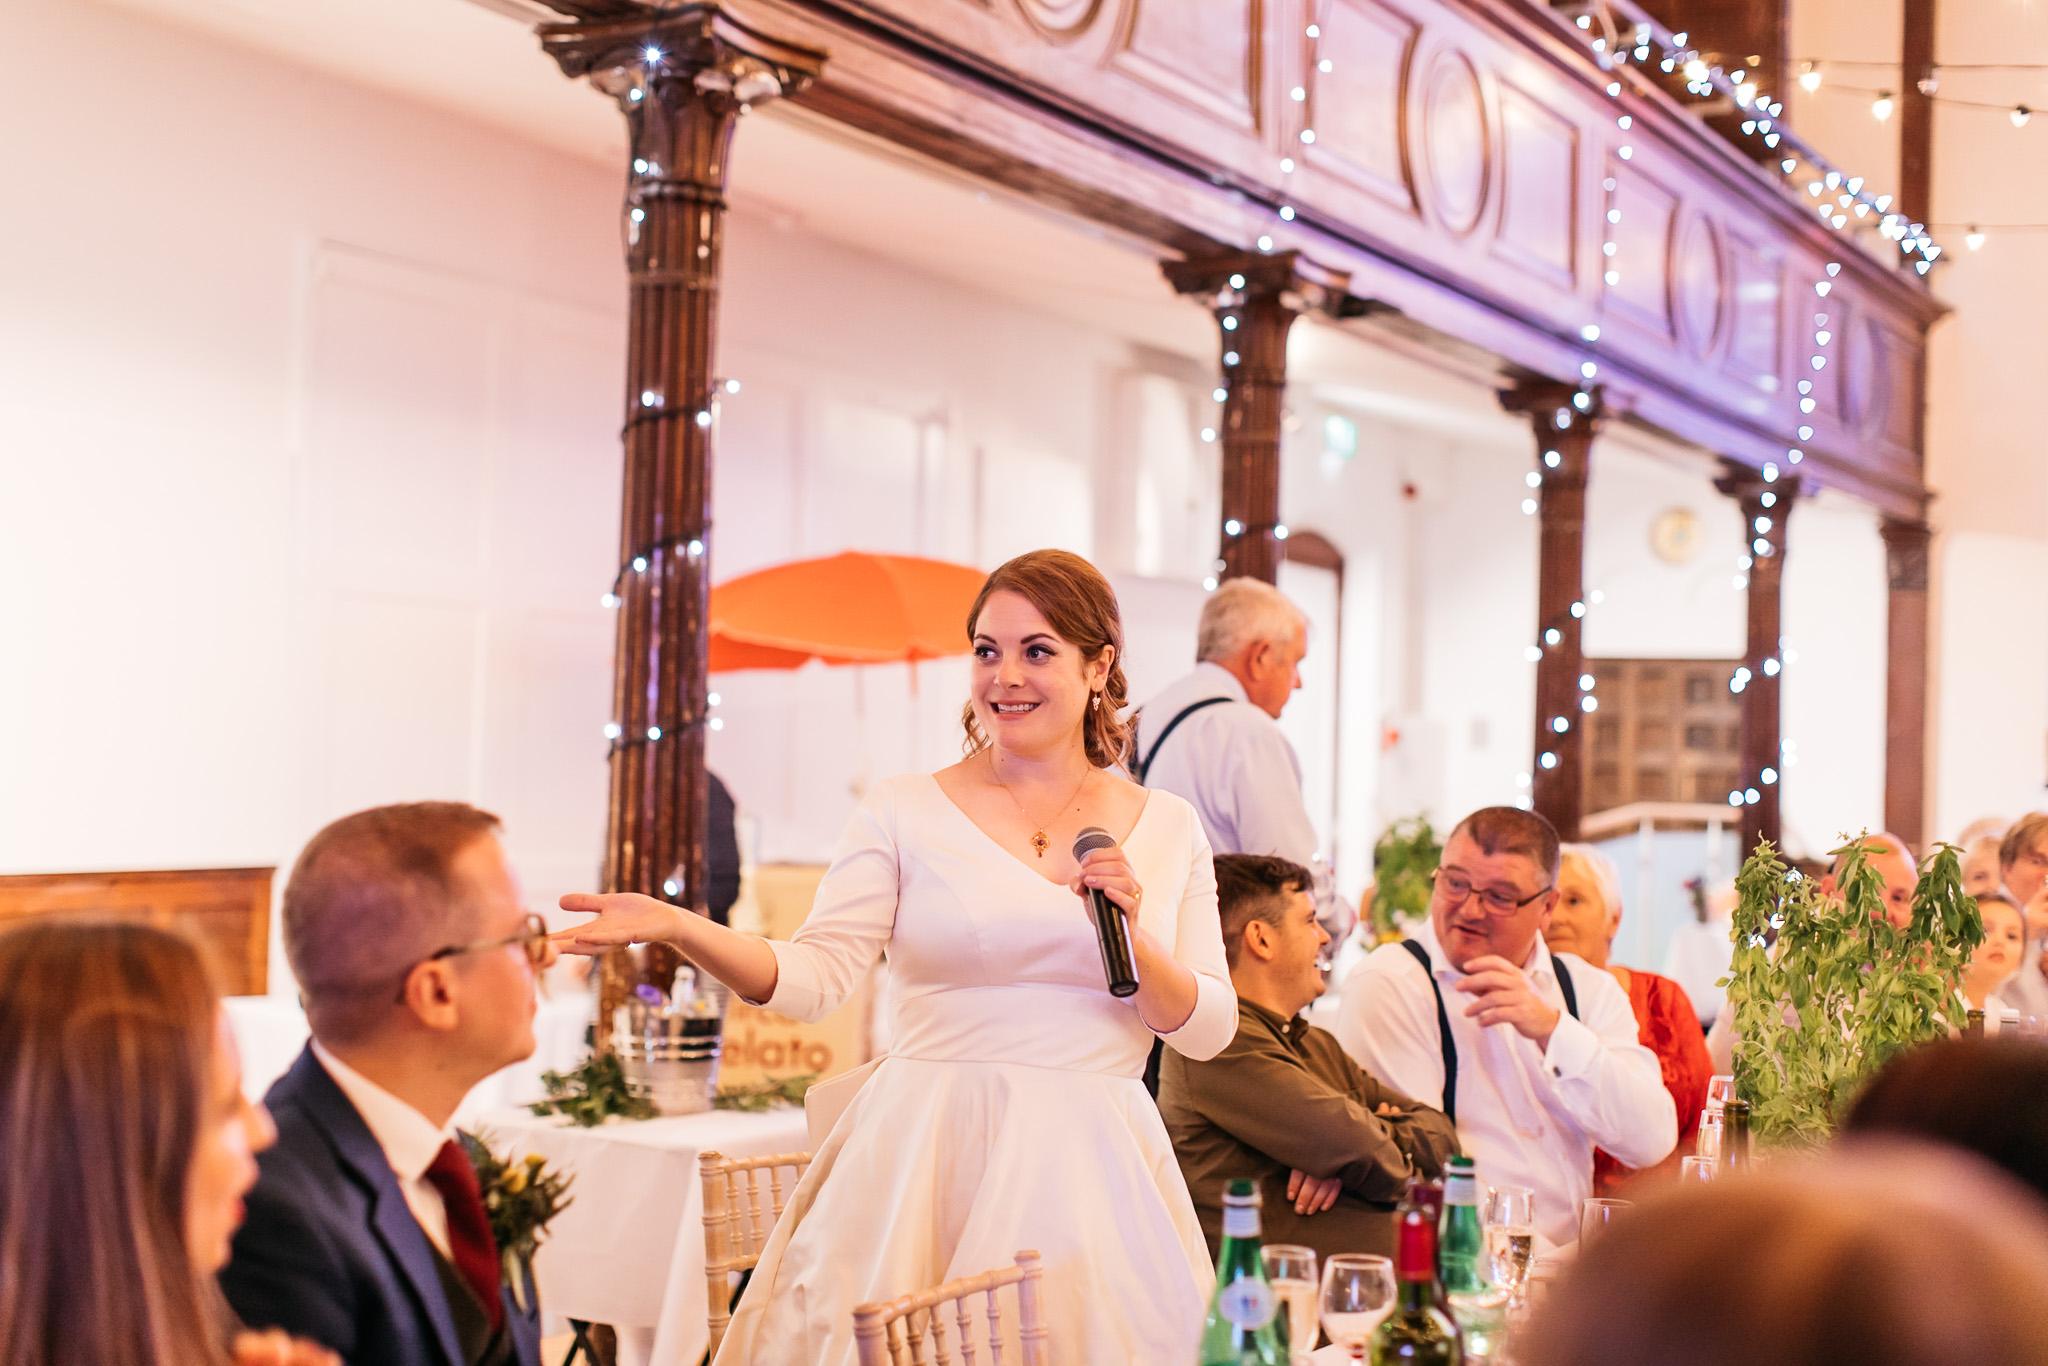 st_andrews_fabrica_brighton_wedding_615.jpg